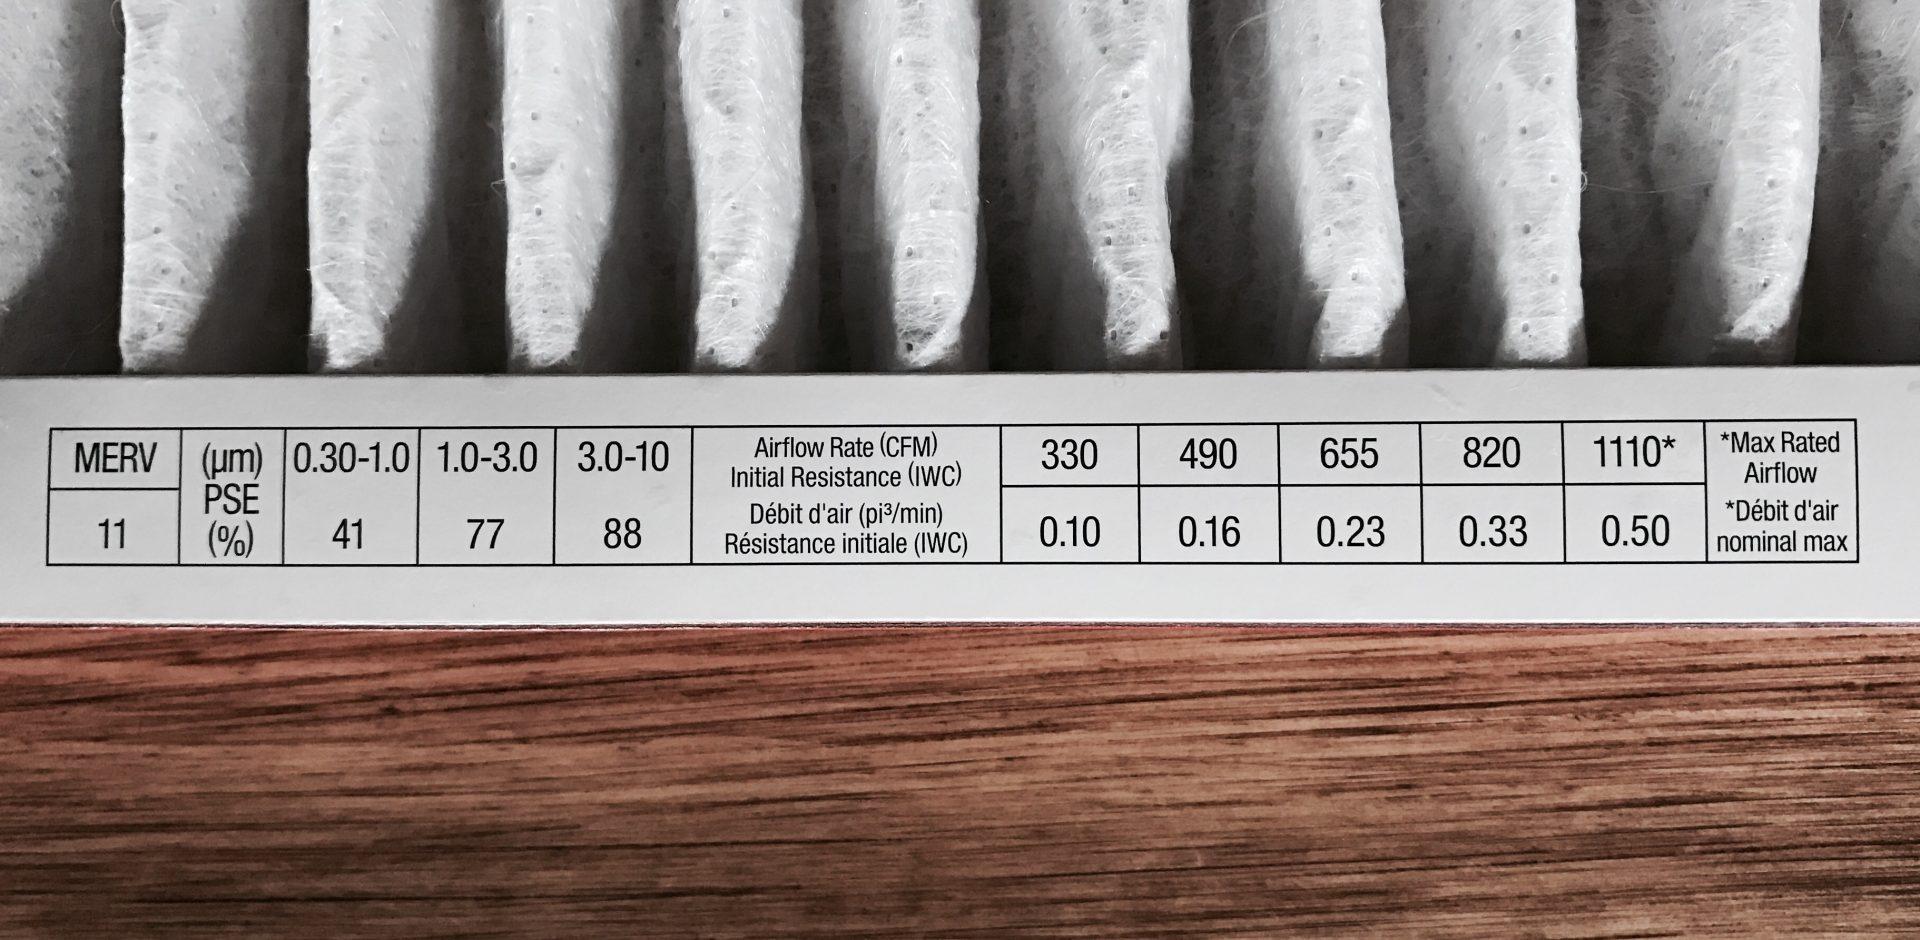 Air Filter Static Pressure Drop - HVAC School